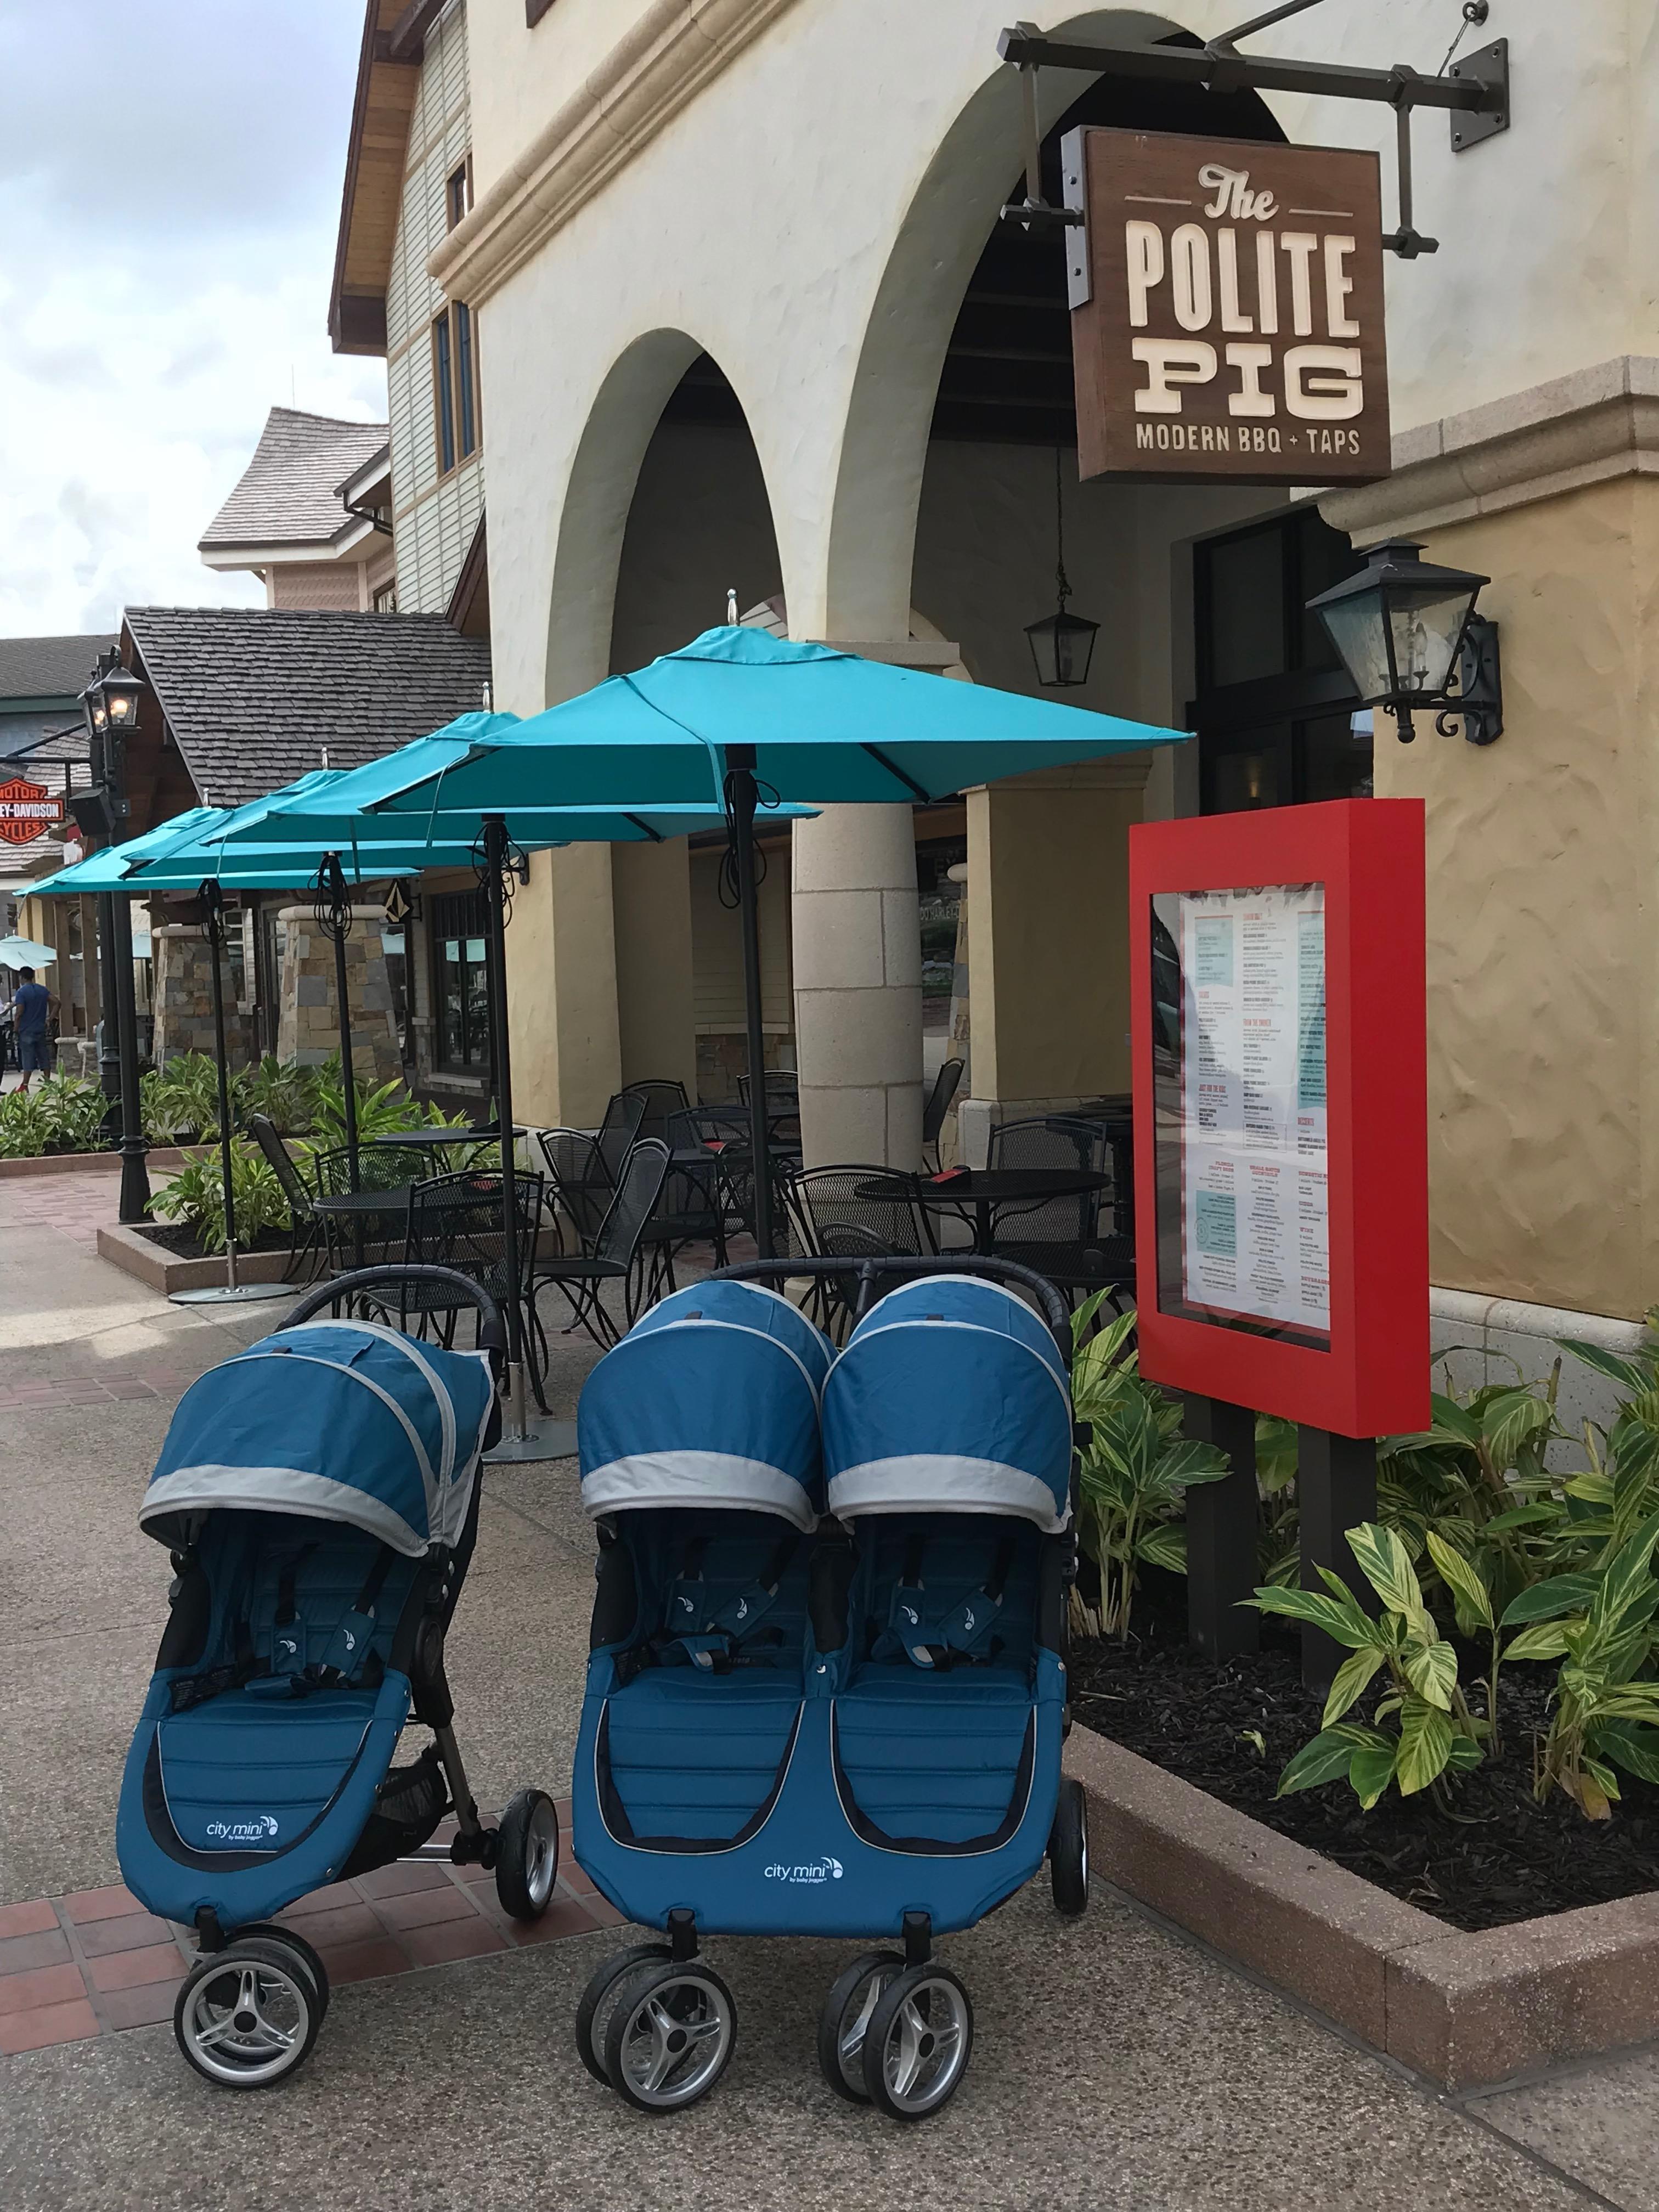 Stroller Rentals Disney image 73